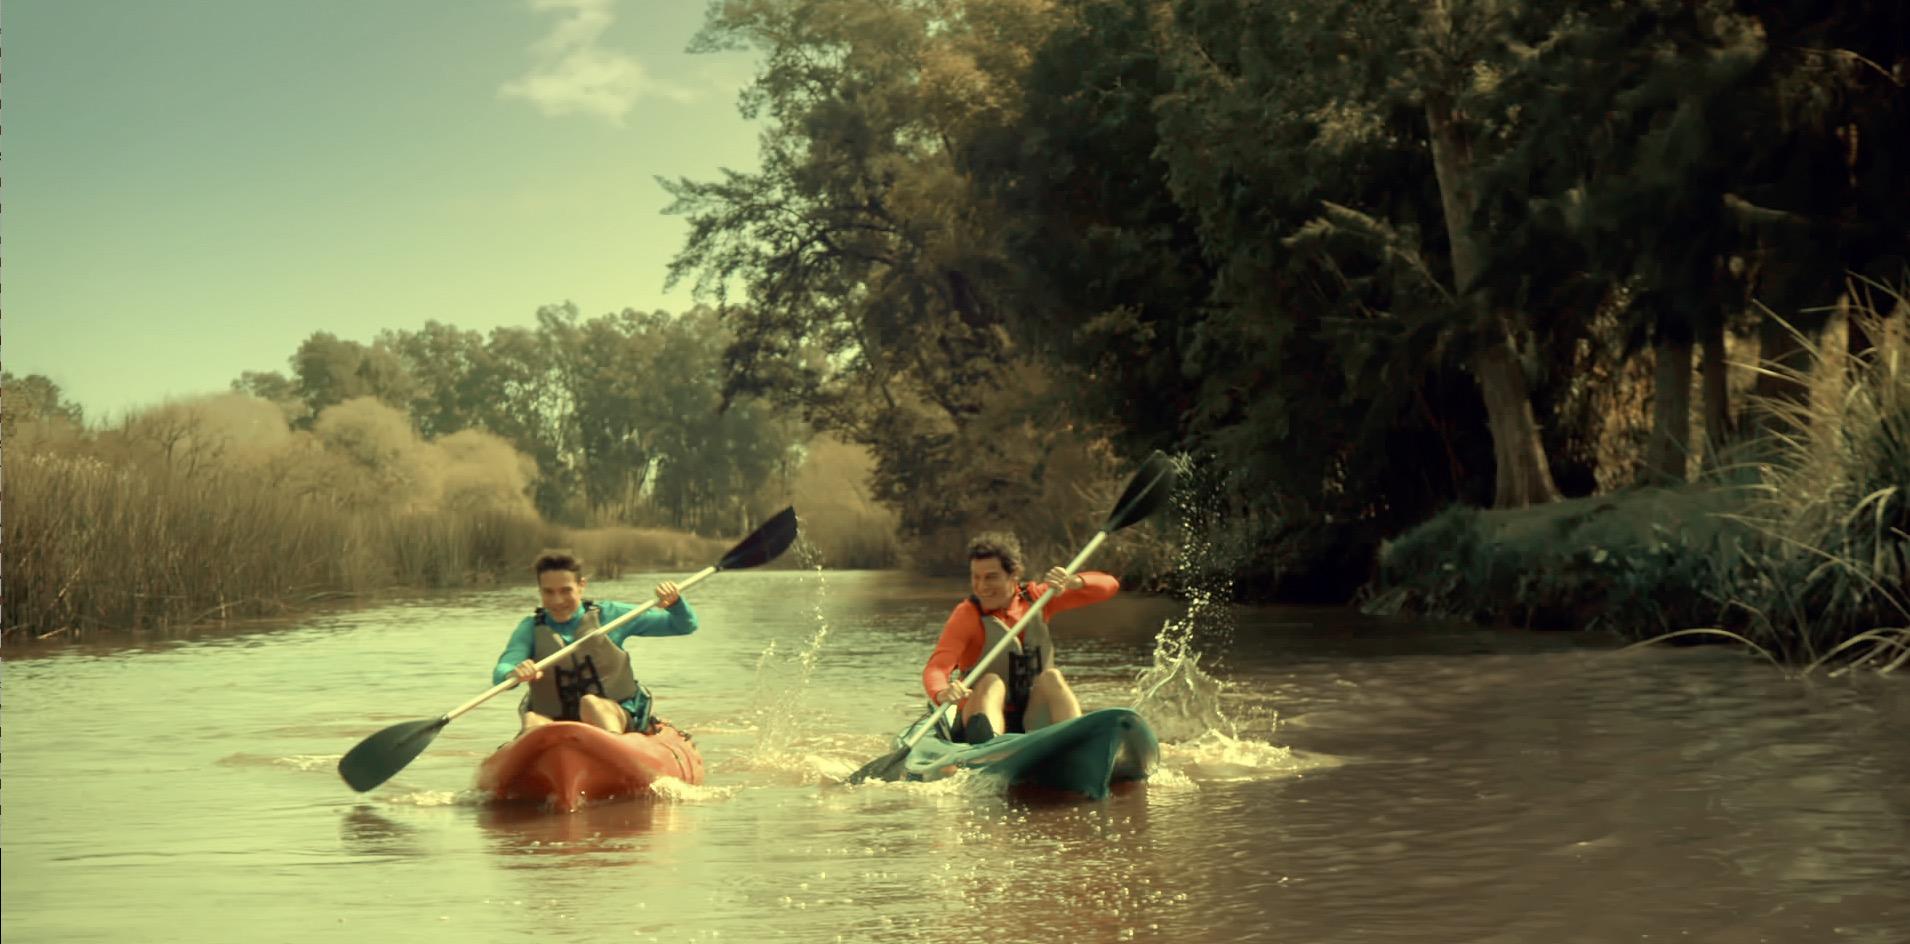 ICBC - Kayak